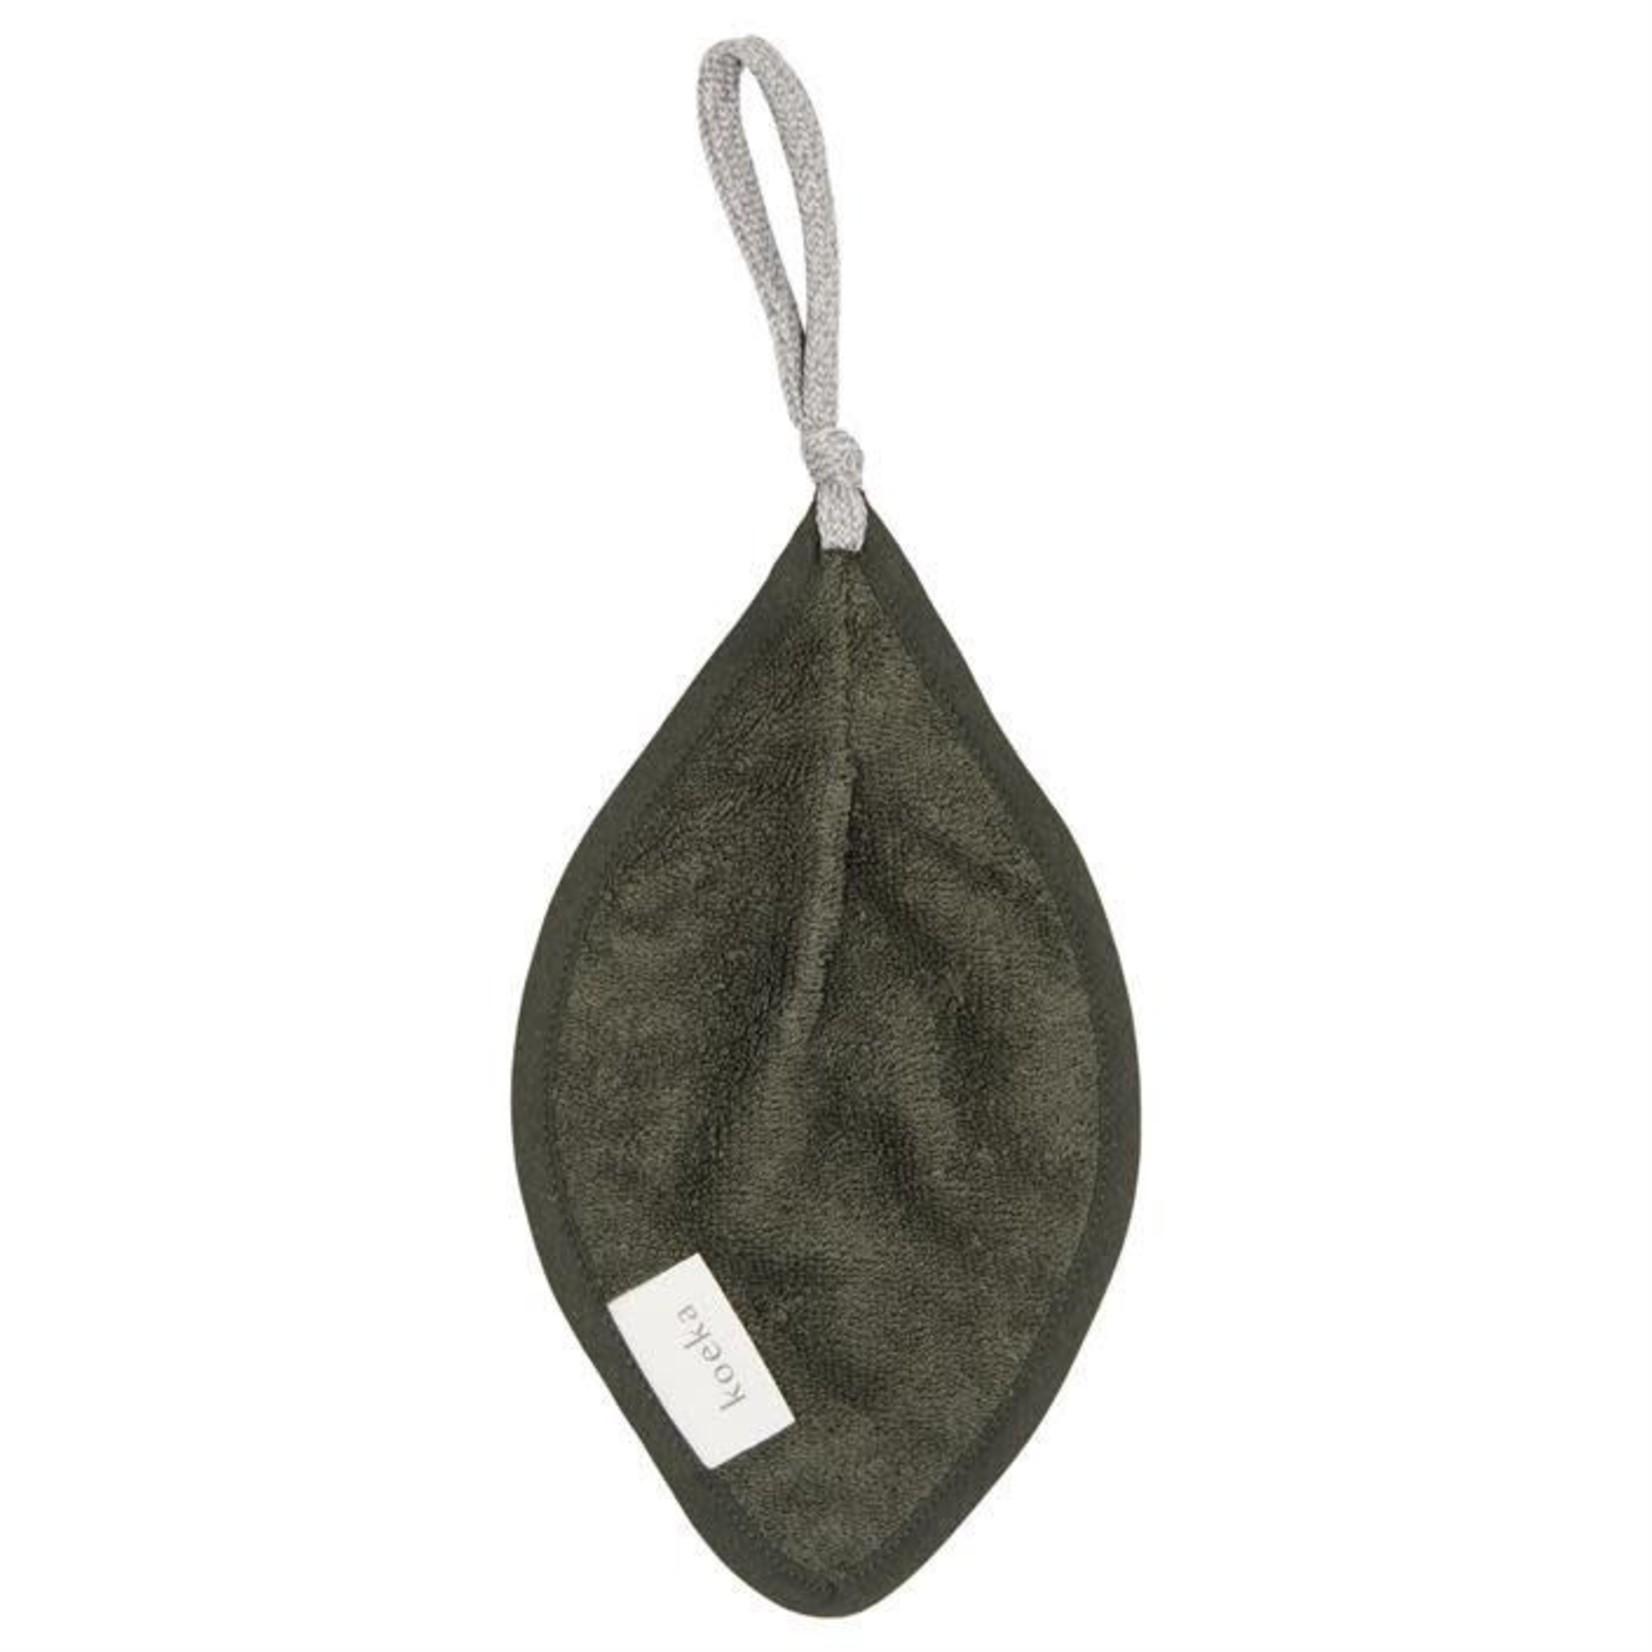 Koeka Speendoekje drop Dijon Organic (Thyme)